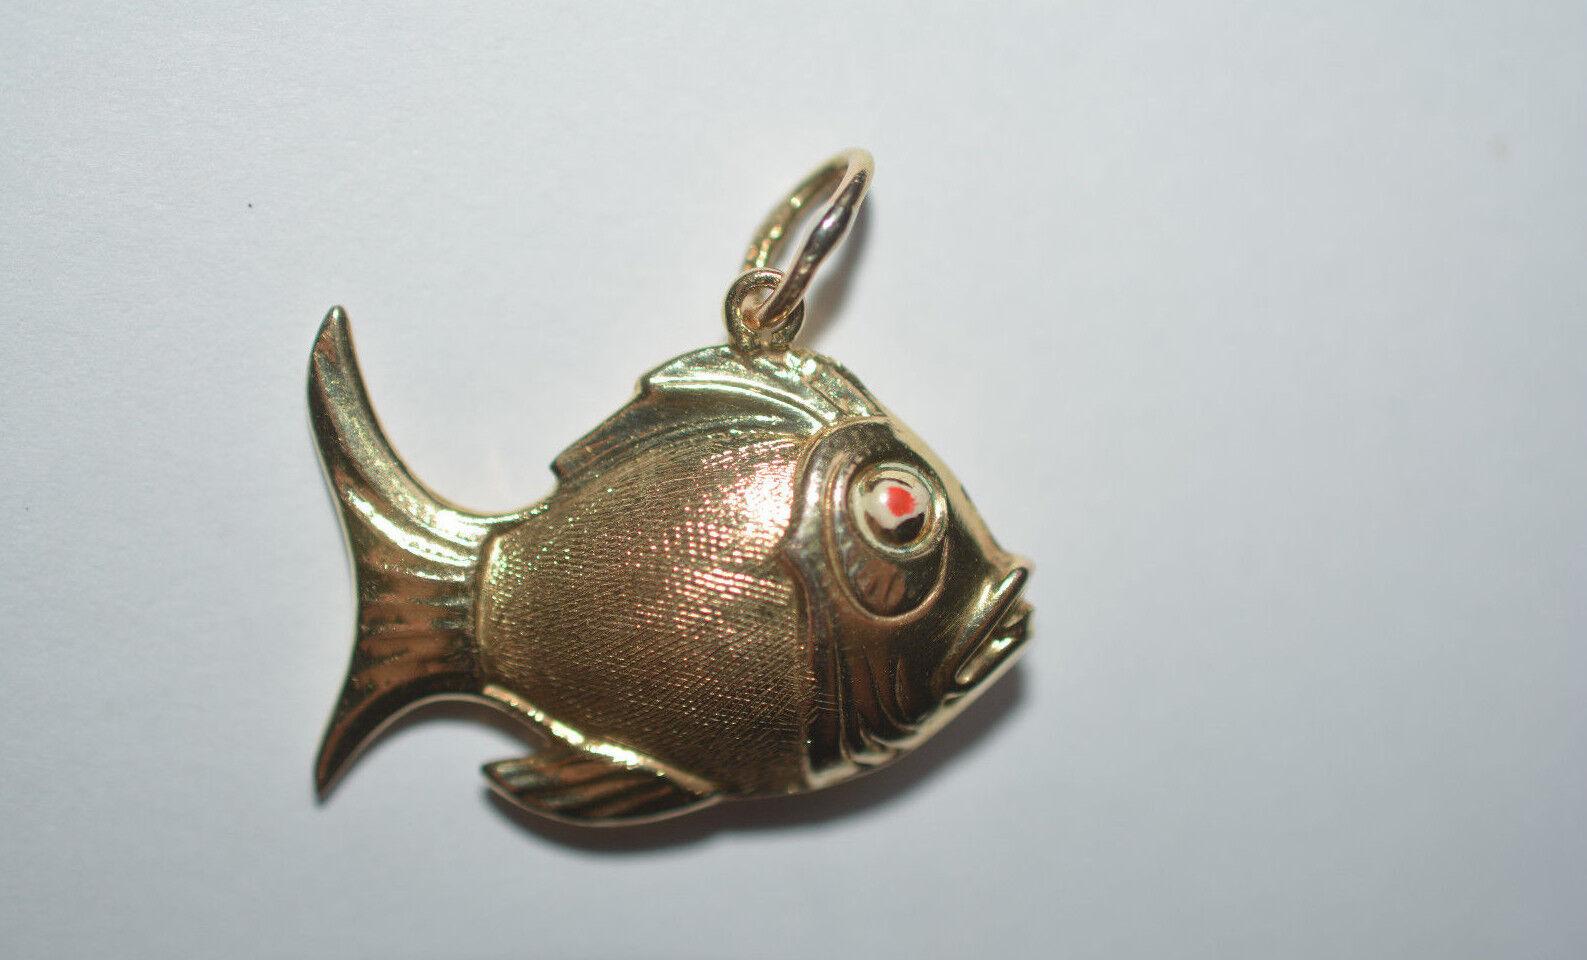 goldener Fisch Anhänger 333er gold 8C gold charms fish or poisson pesce pescado